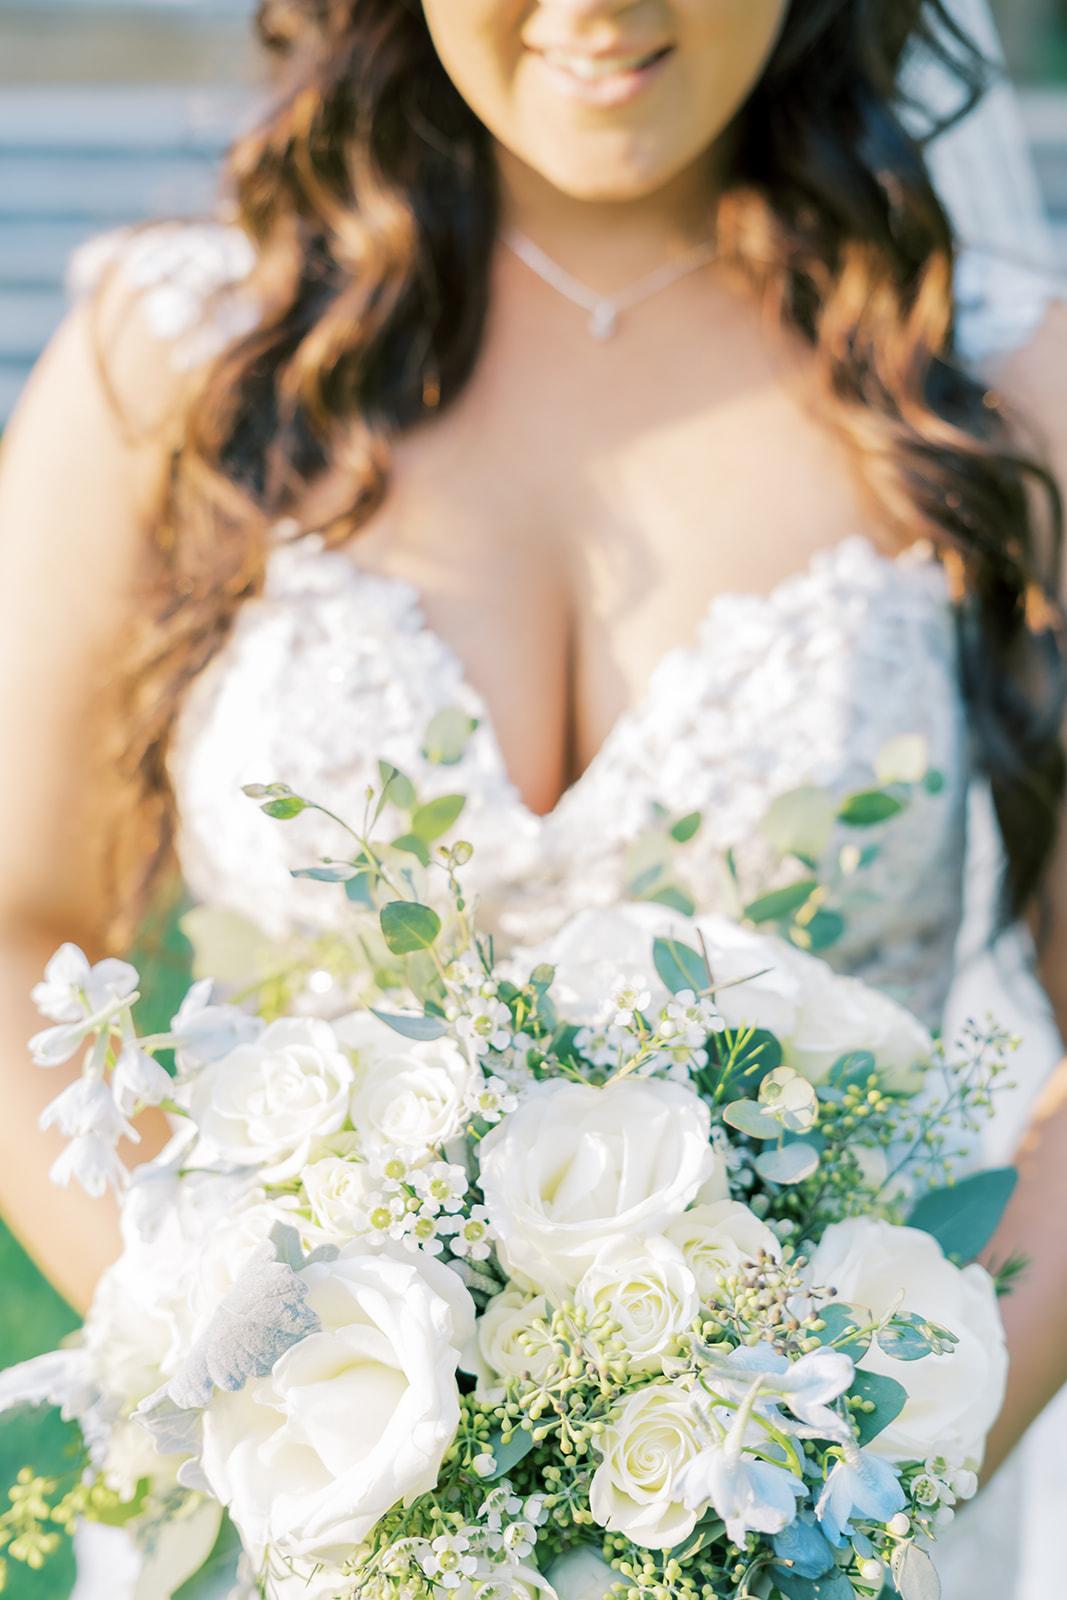 Nashville Flower Market Bouquet | Nashville Bride Guide